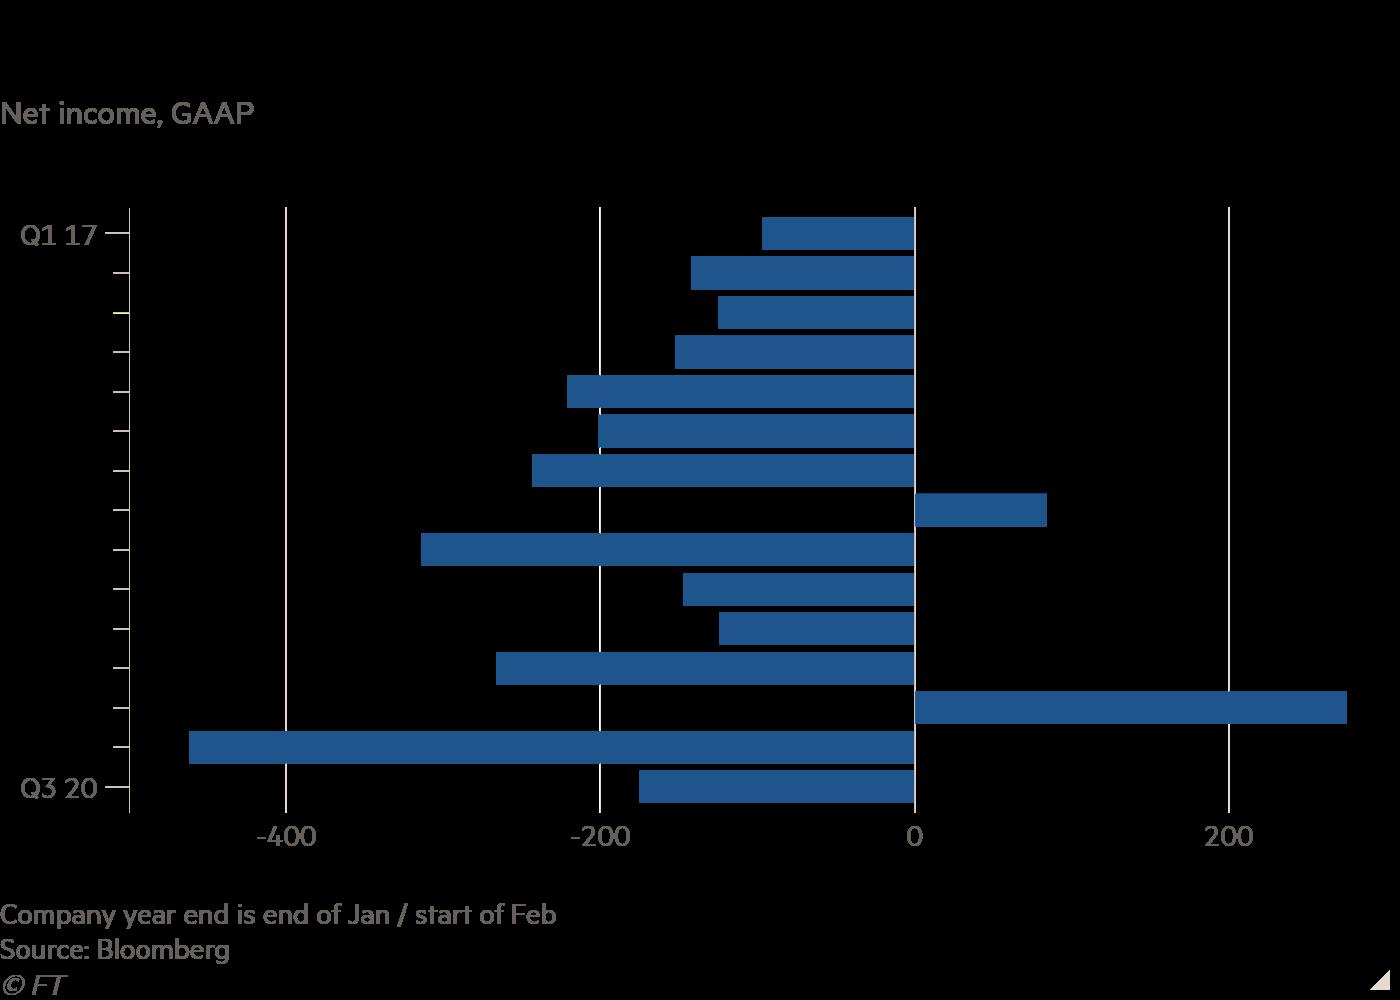 Bar chart of Net income, GAAP showing Losses at Hudson's Bay Company